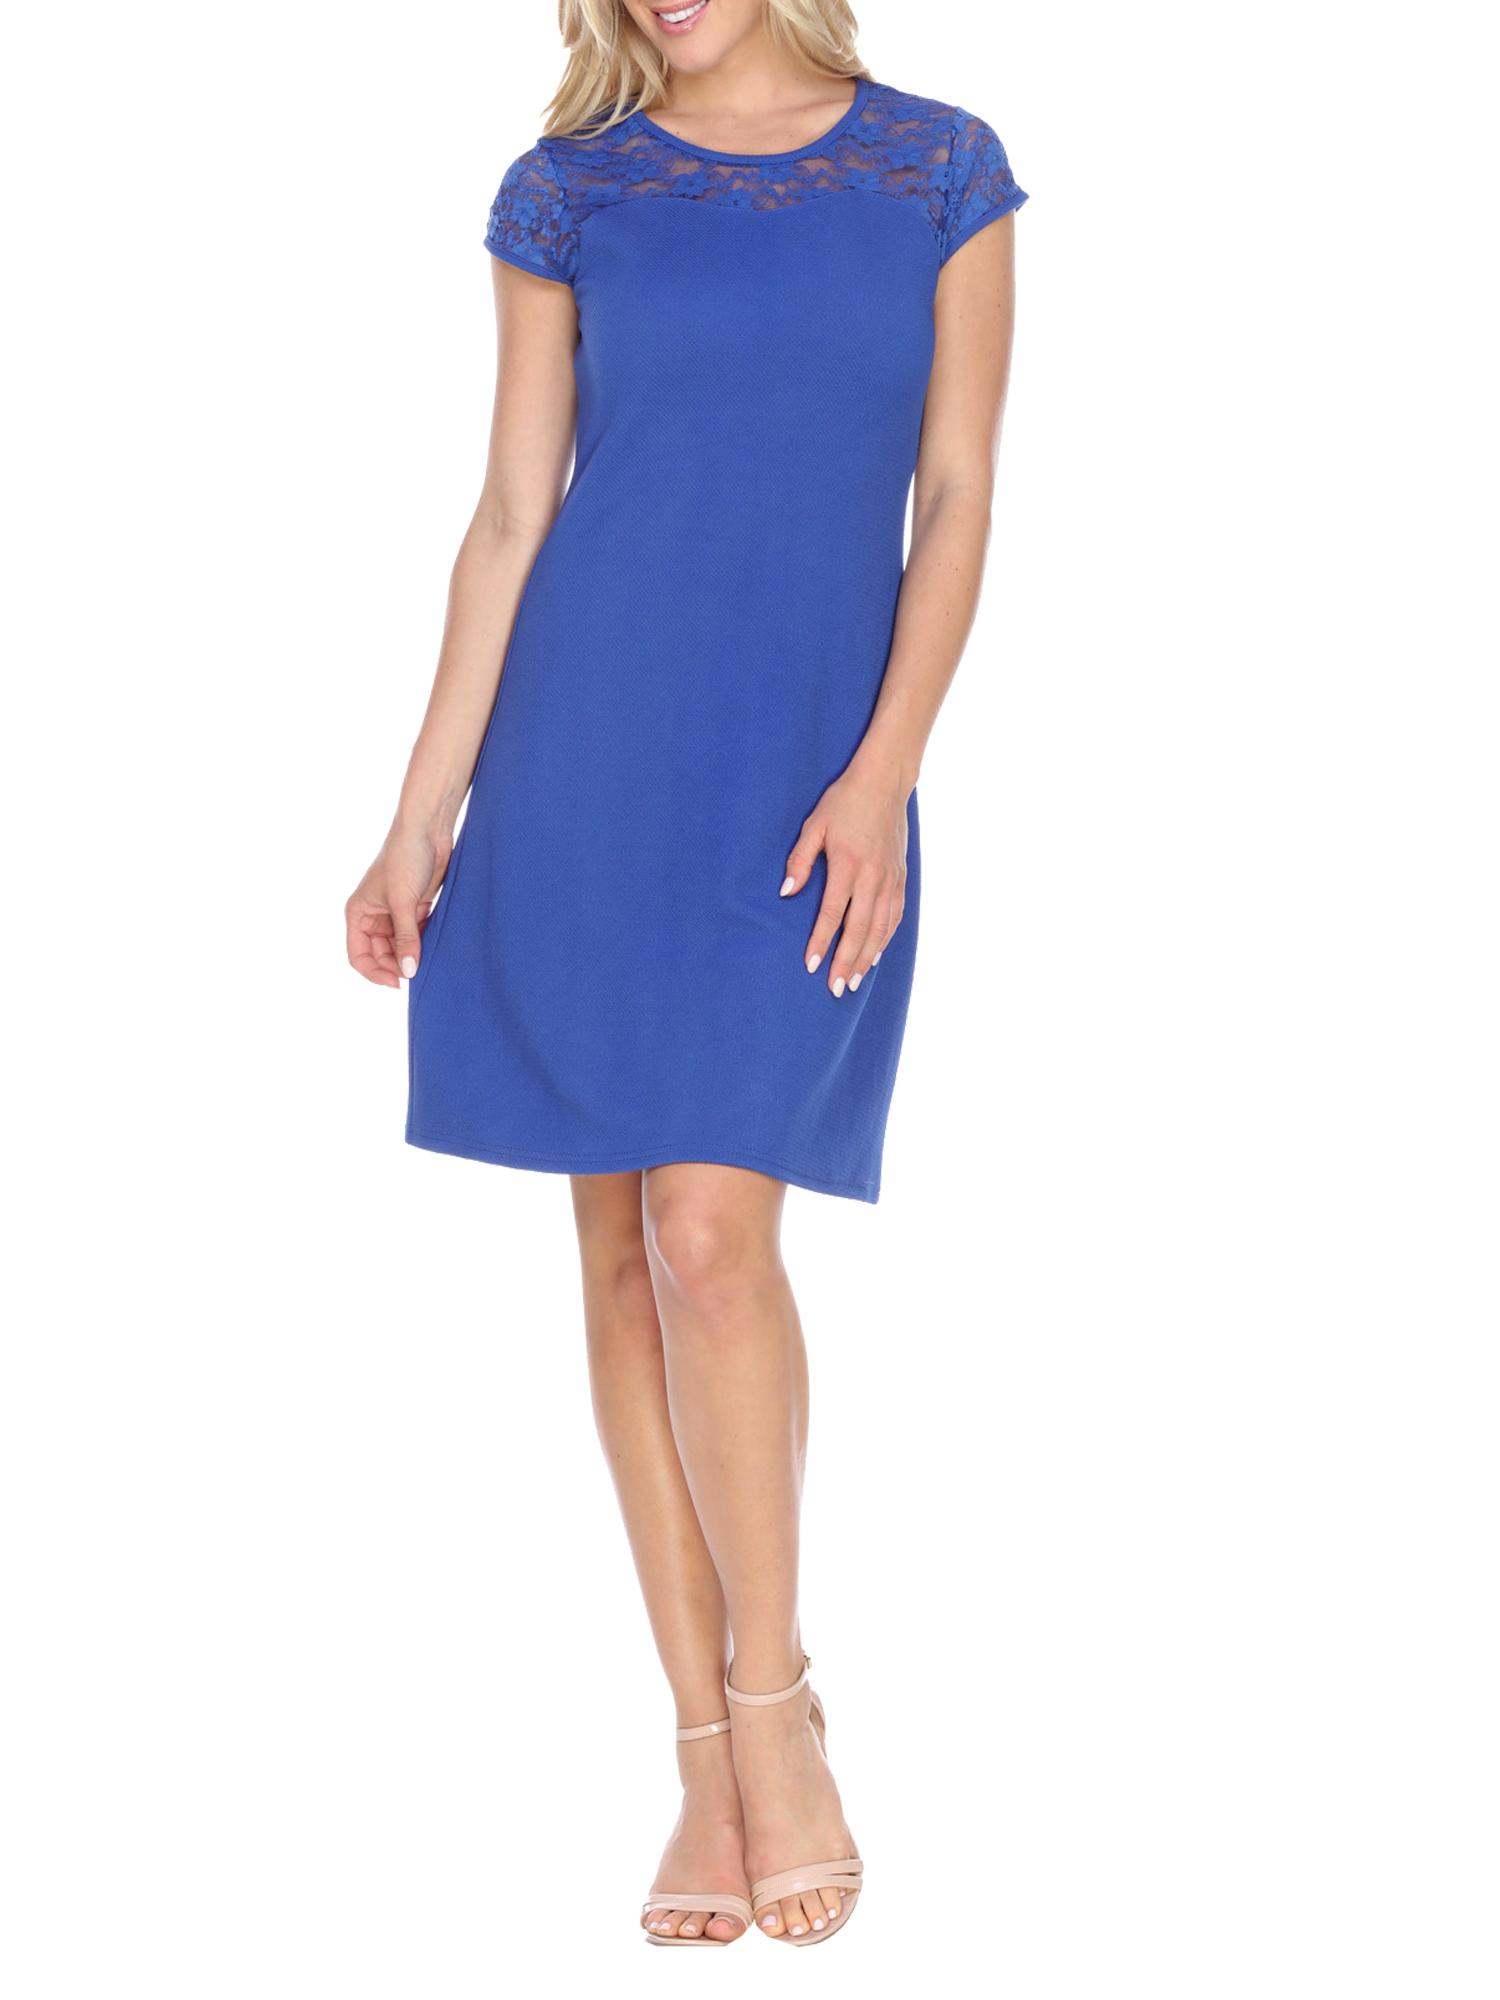 Women's Lace Detailed A-Line Dress